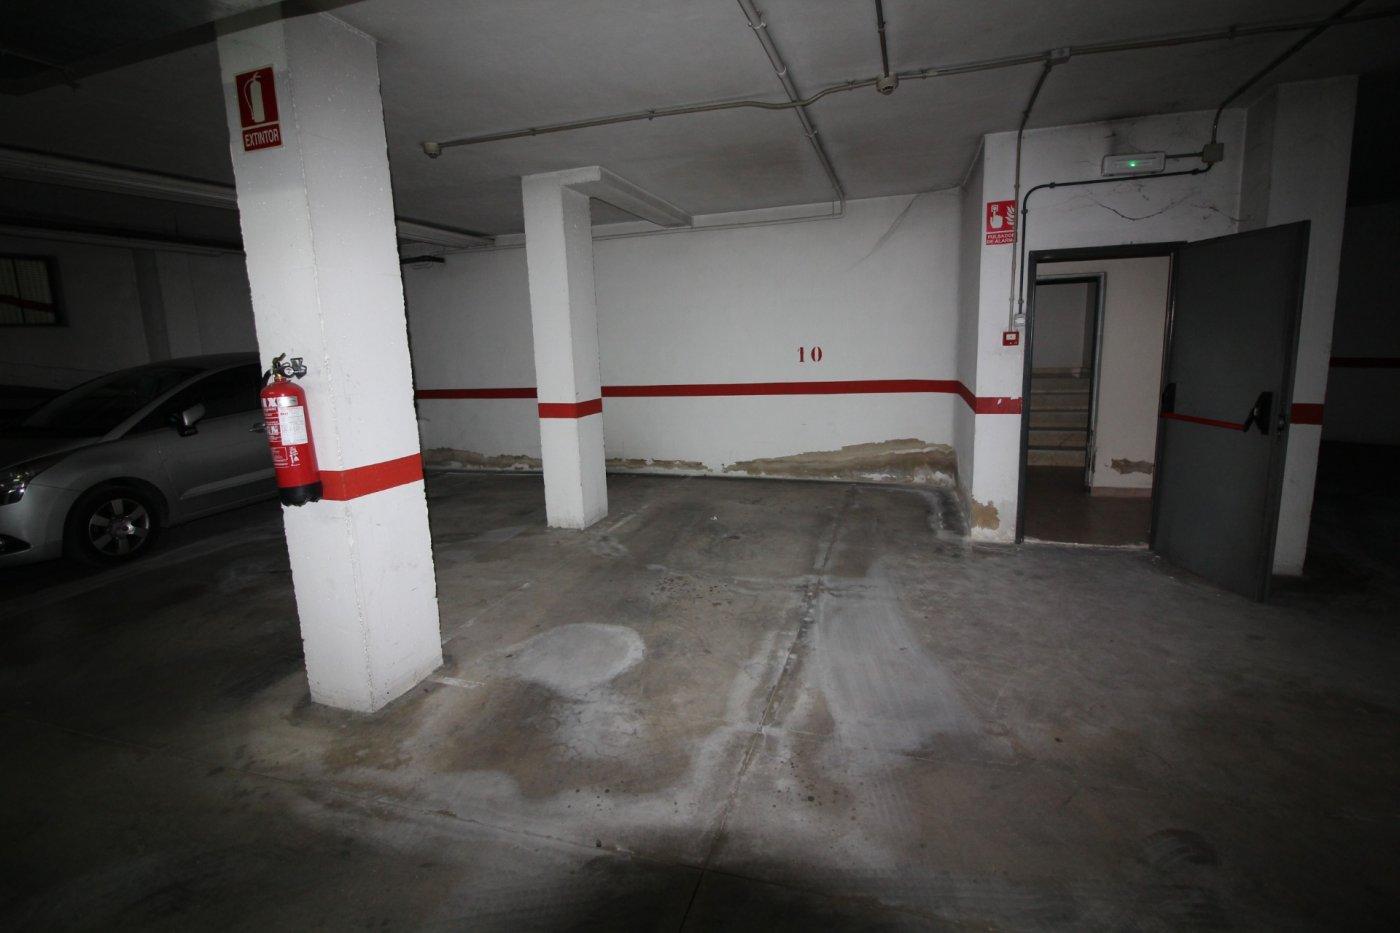 Parking coche  Callosa de segura ,avda- juan pablo ii. Cómoda plaza de garaje   trastero